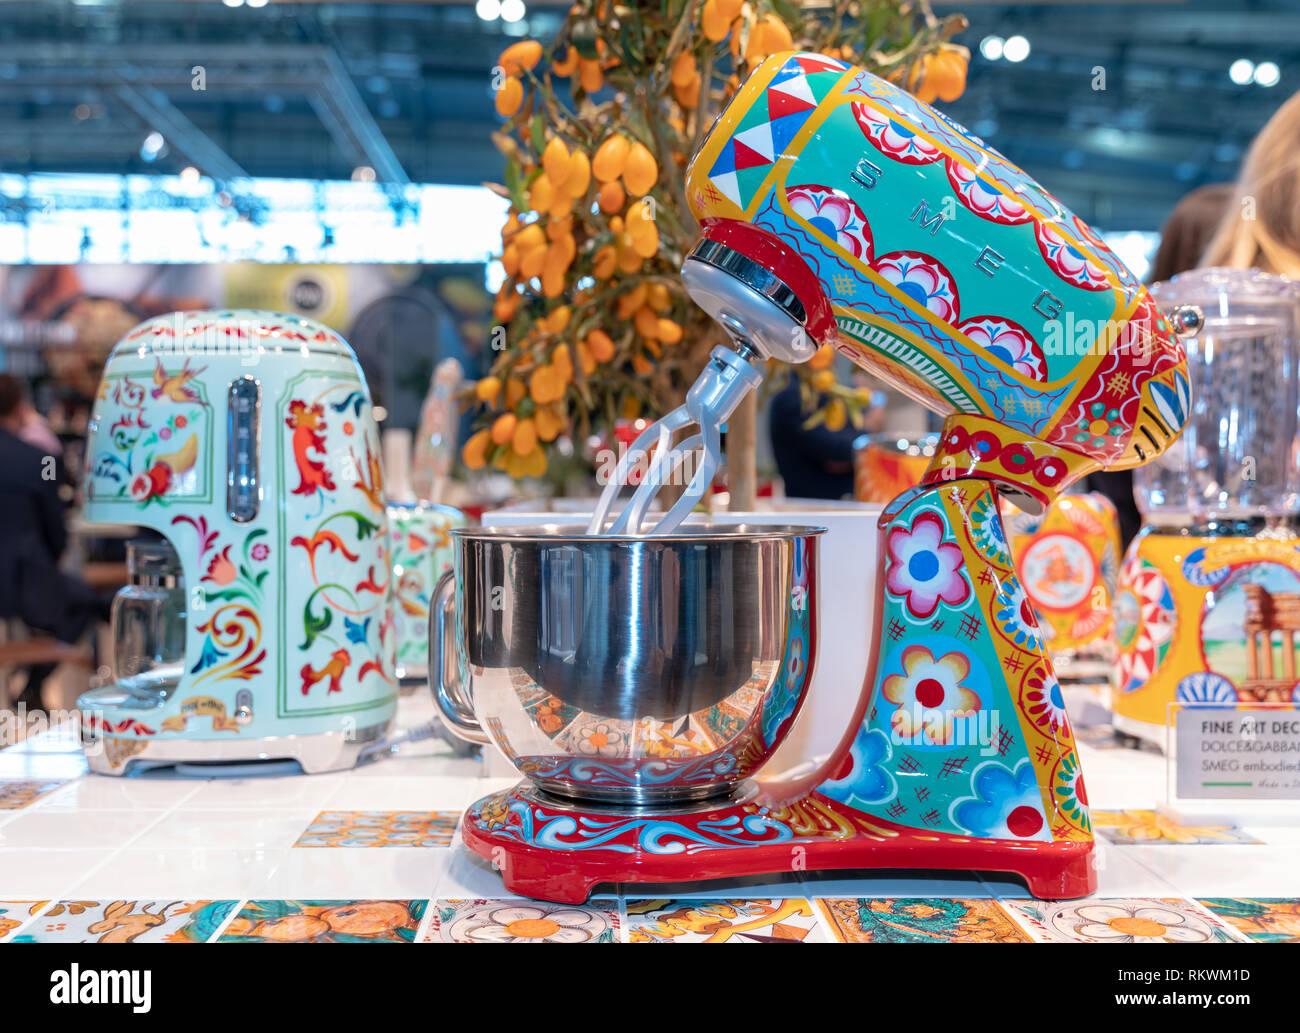 Smeg Kühlschrank Dolce Gabbana : Smeg stockfotos & smeg bilder alamy